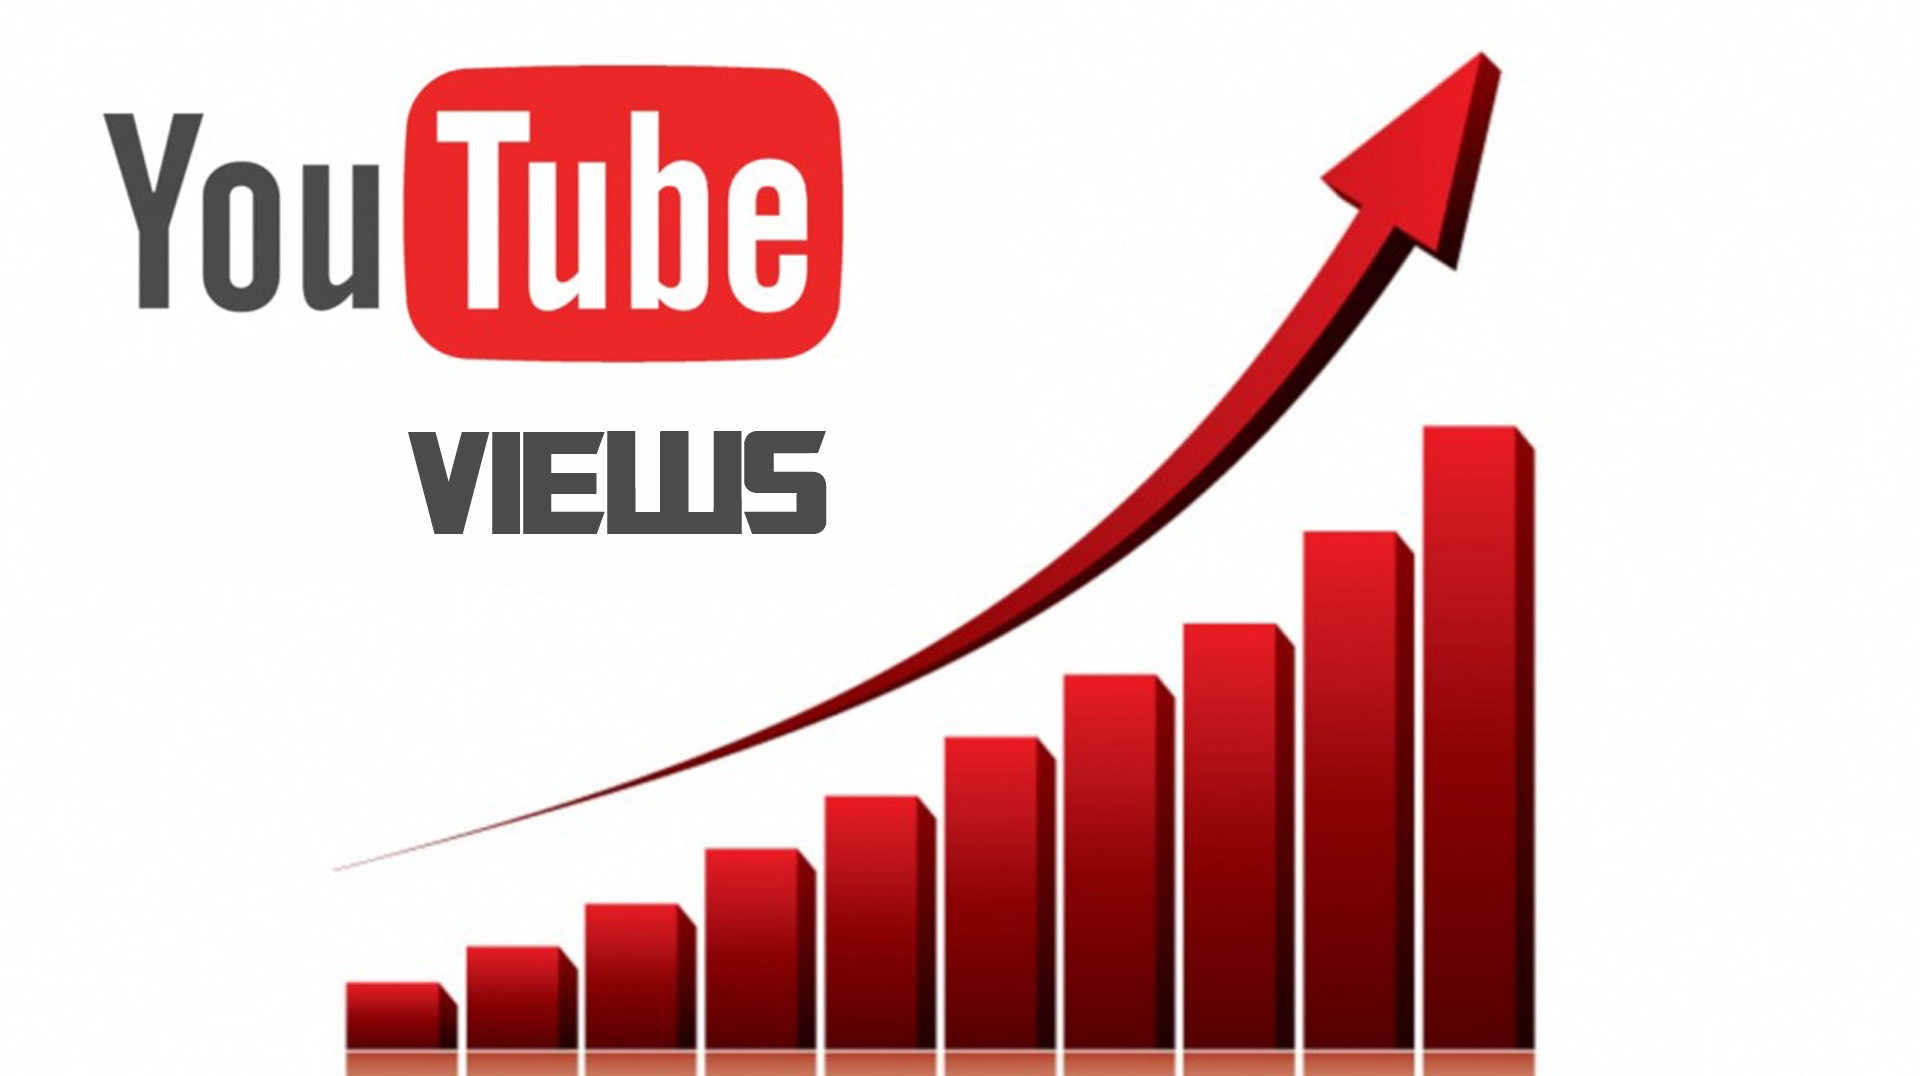 YouTubeアルゴリズムでアクセスを増やせ